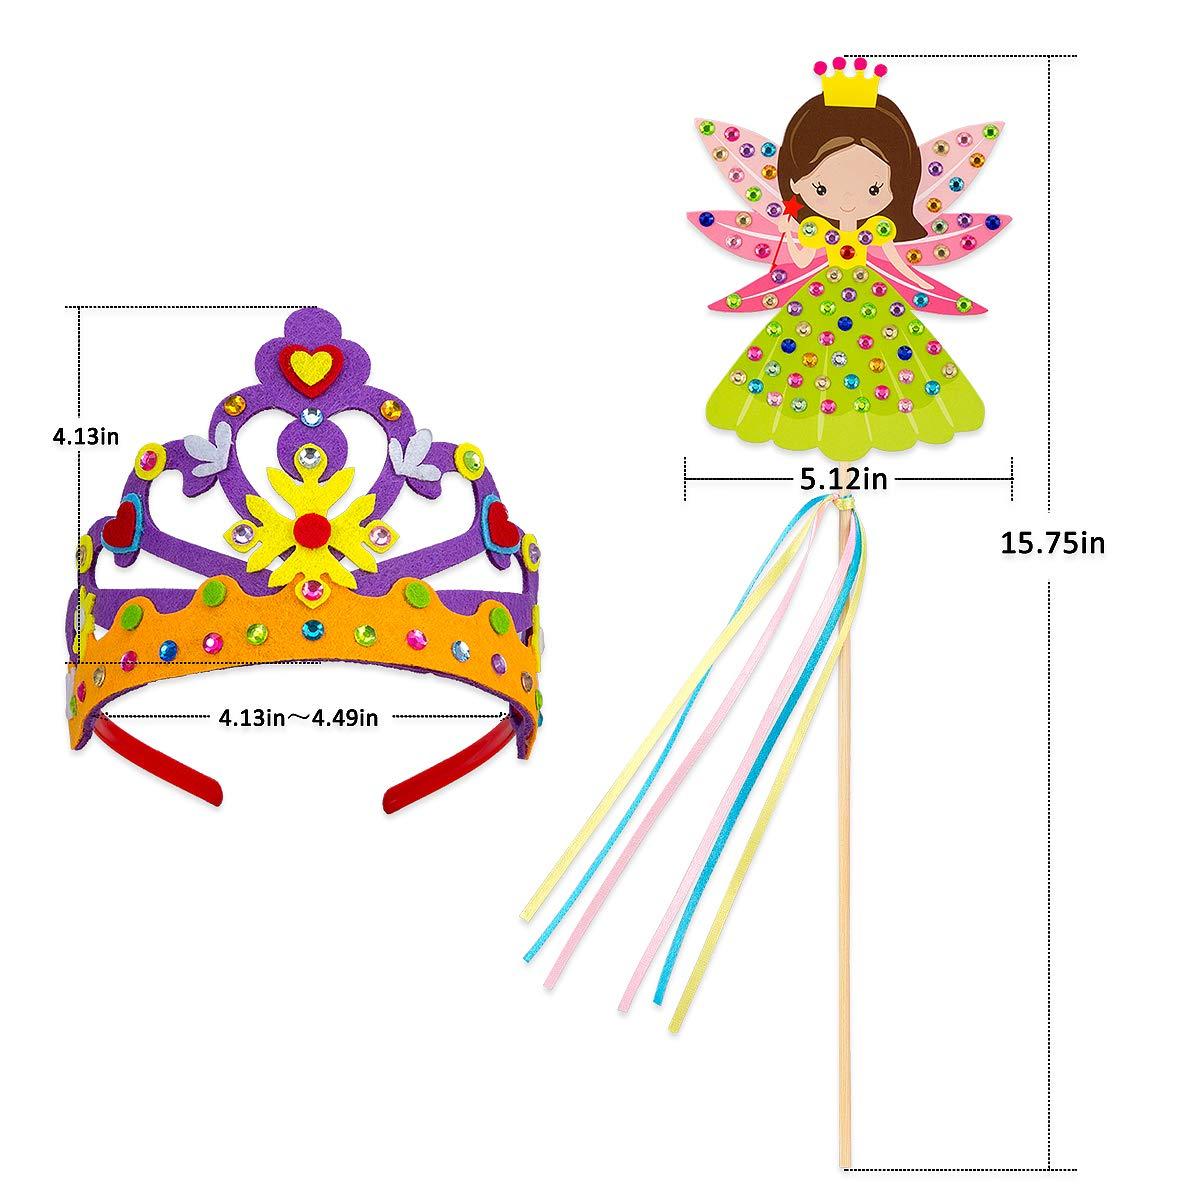 Make Your Own Princess Crown and Fairy Magic Wands Girls Party Favors PARBEE 8 Set Princess Tiara and Wand DIY Crafts